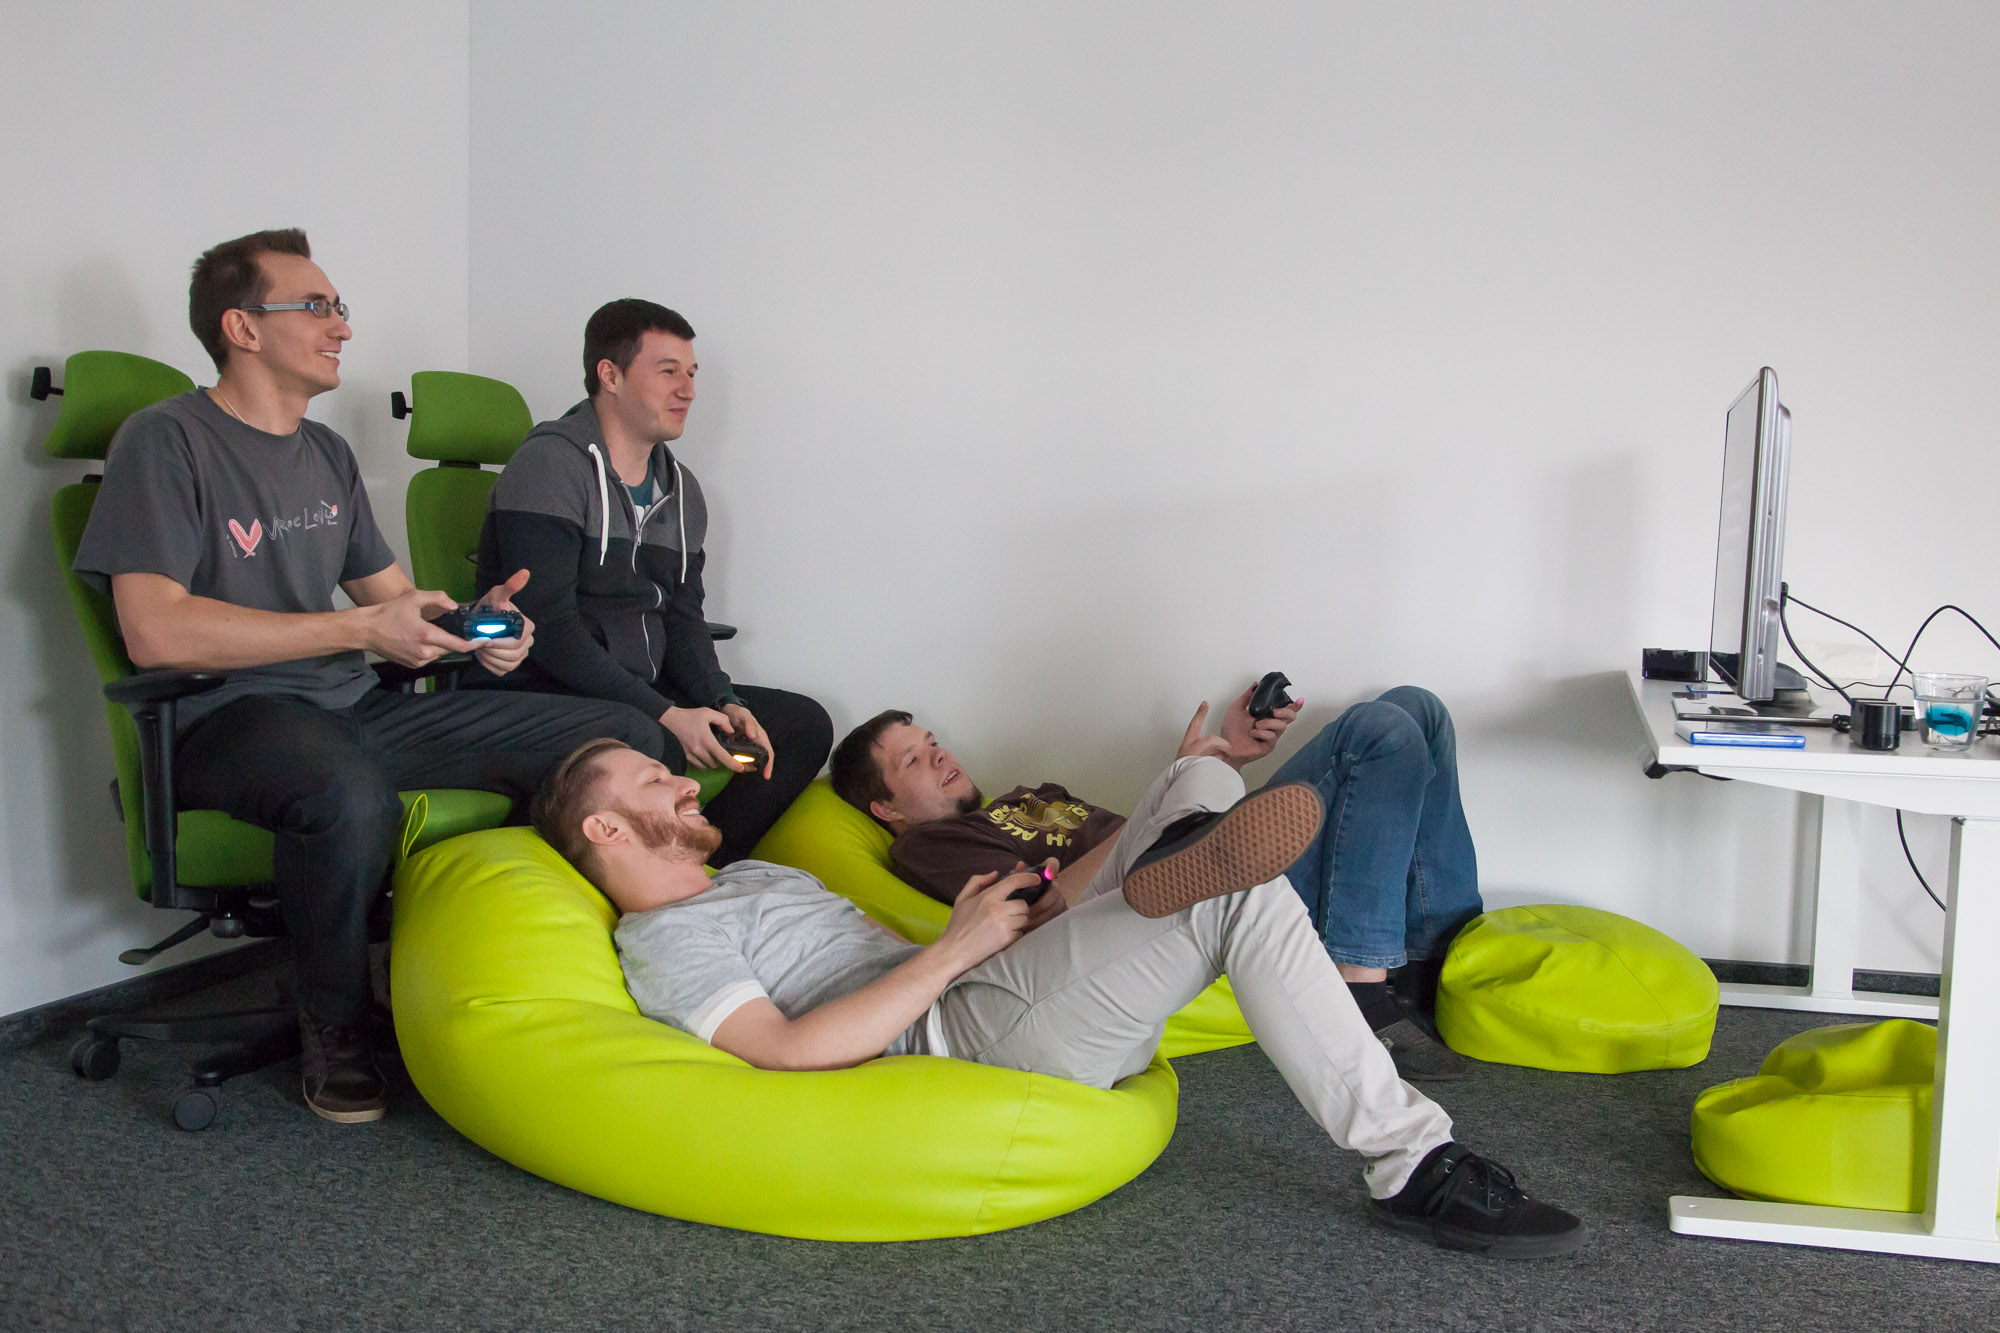 Developers at Schibsted Tech Polska´s office in Gdansk taking a break from programming. Photo: John Einar Sandvand